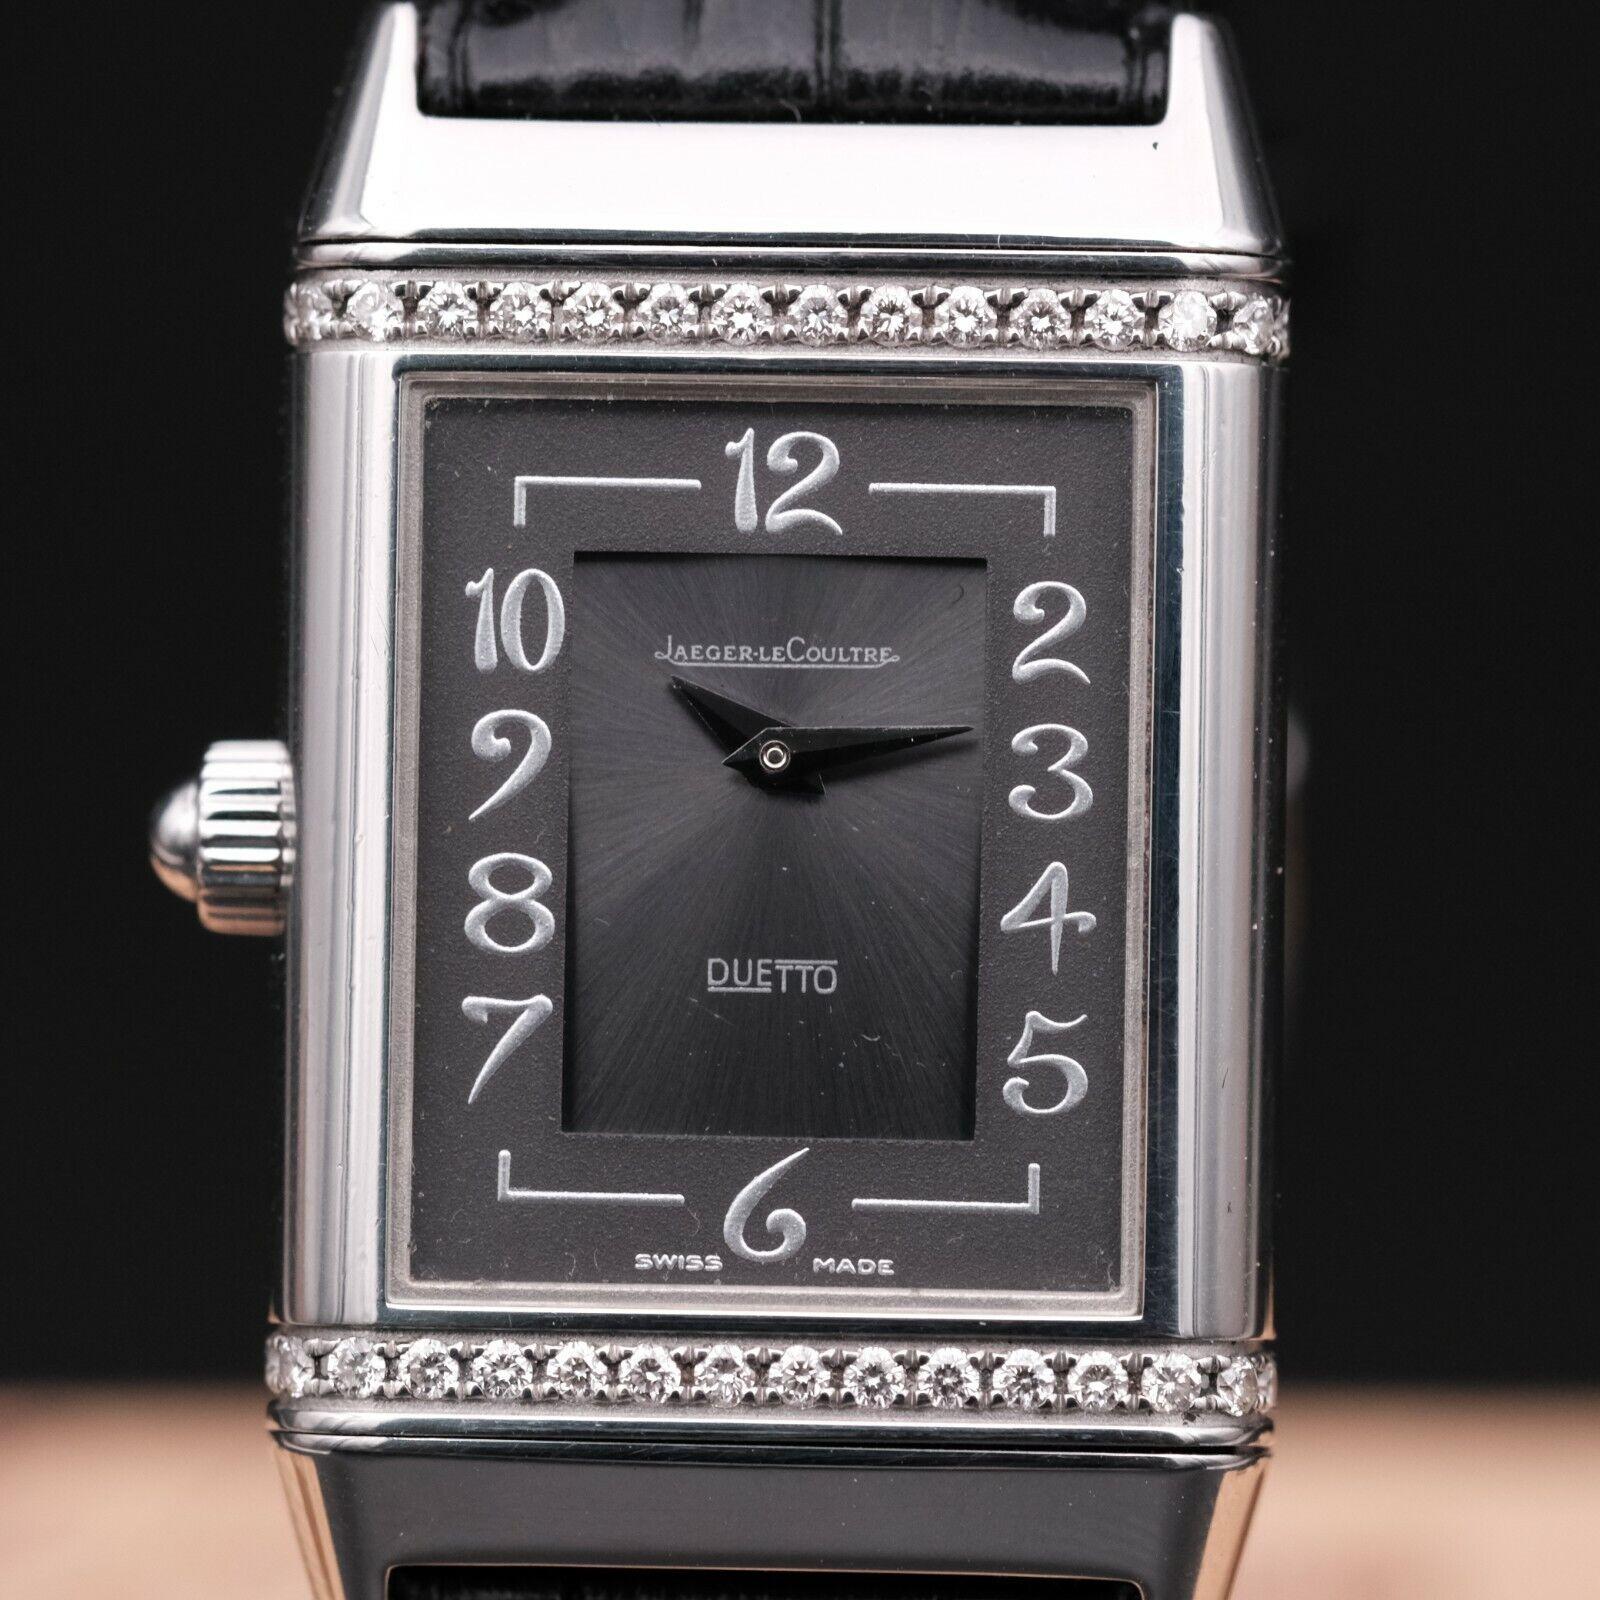 AUTHENTIC RARE JAEGER LECOULTRE REVERSO DUETTO DIAMOND REF 256.8.75, JLC_551772 - watch picture 1